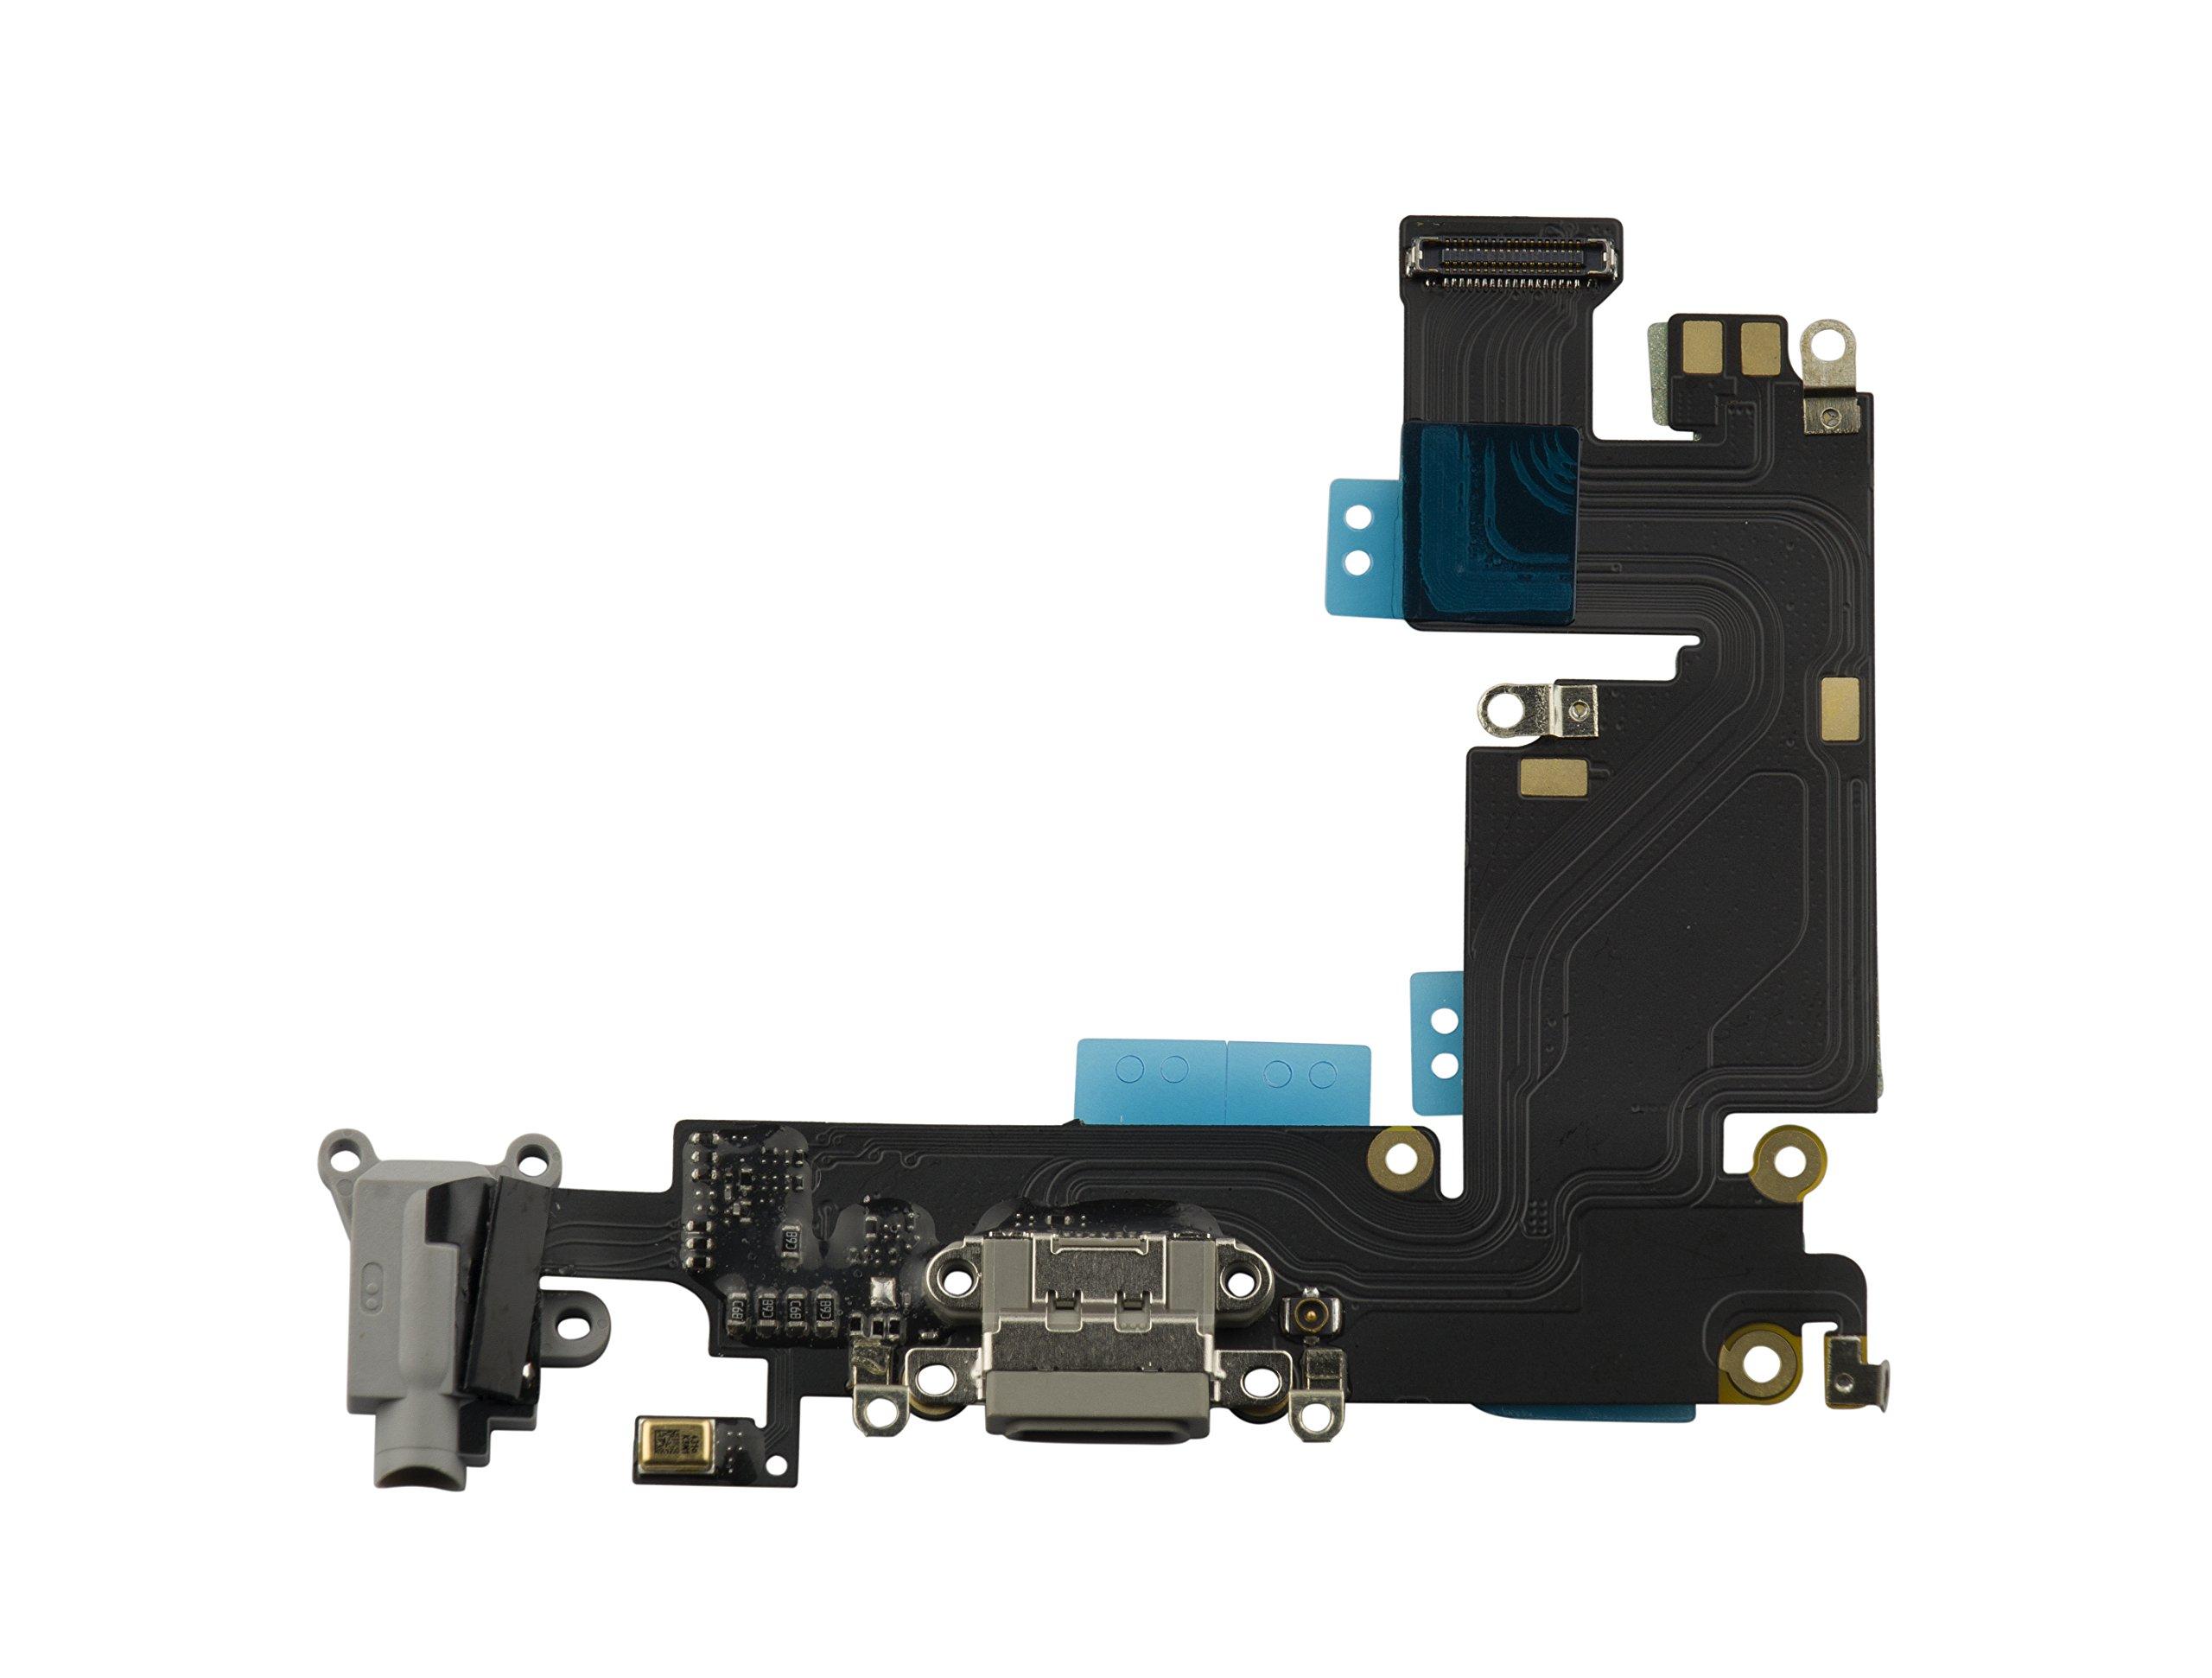 Puerto de Carga para iPhone 6 PLUS 5.5 Grey HKCB